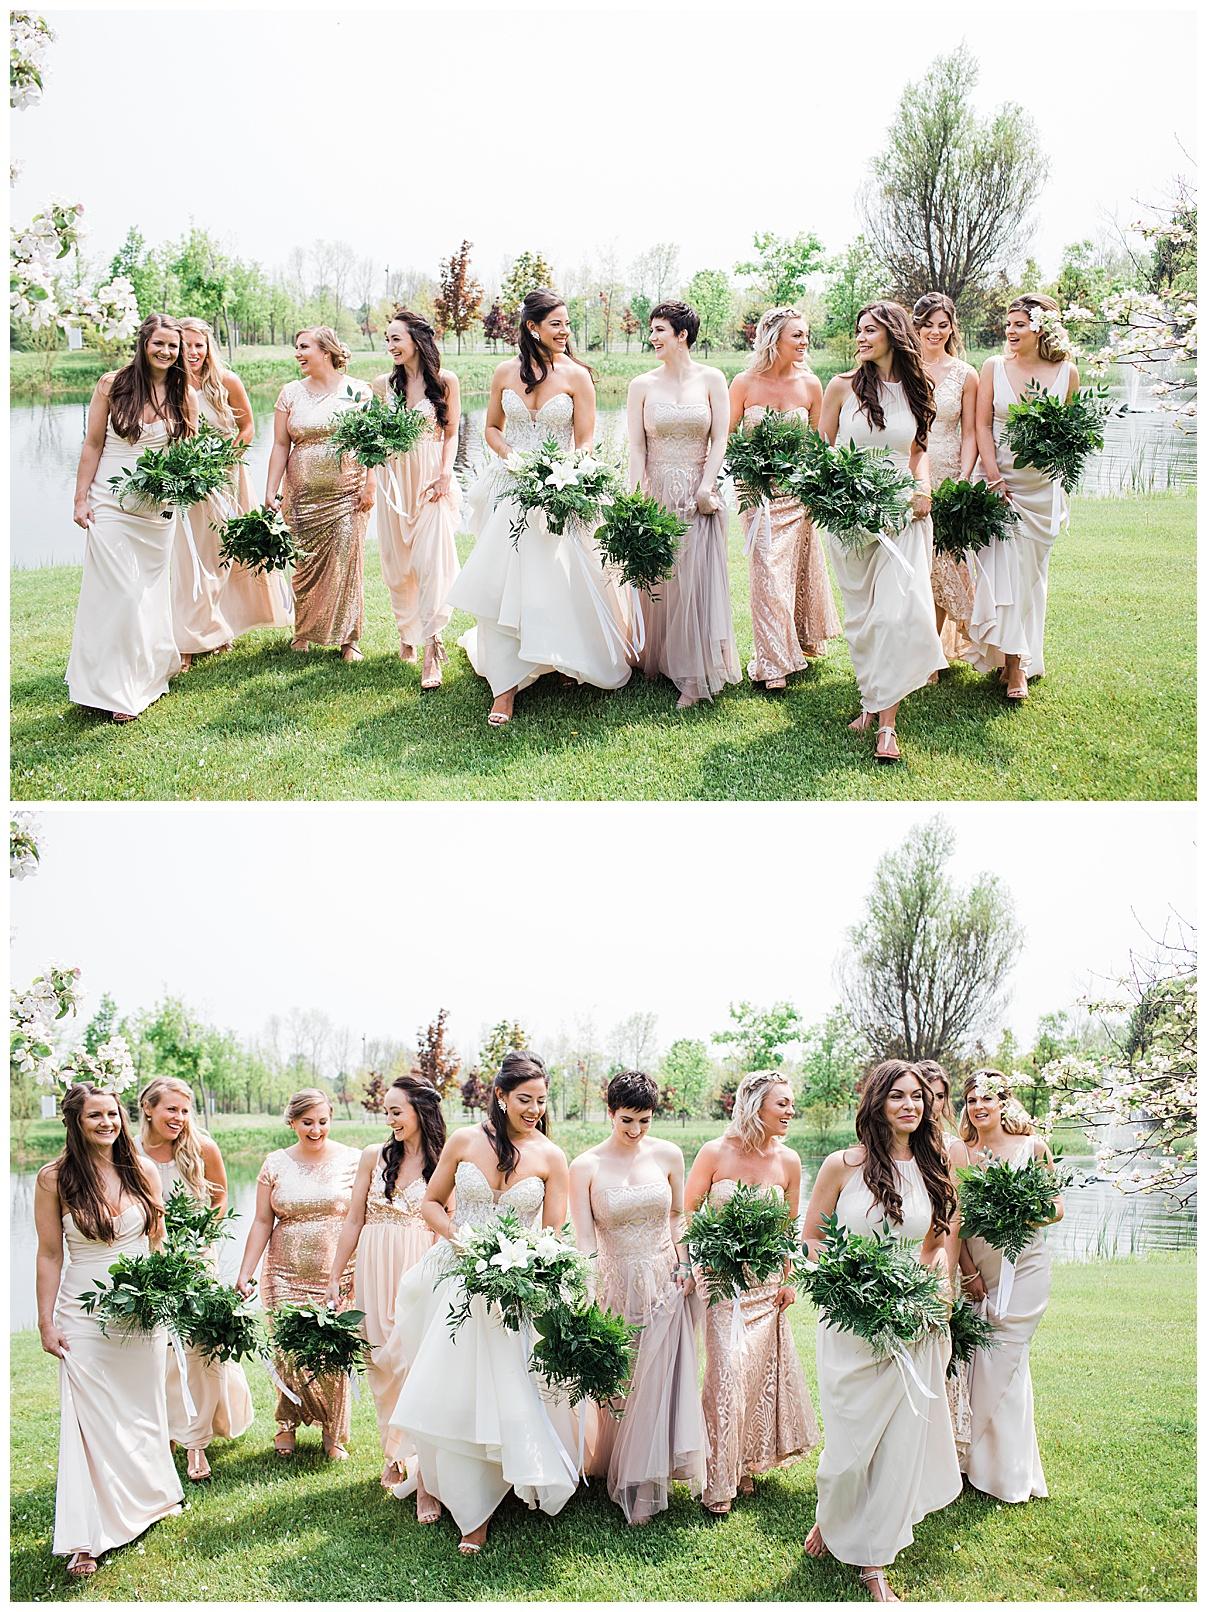 Bride and bridesmaids walking and laughing outside|  Belcroft Estate Wedding| Toronto wedding photographer| Ontario wedding photographer| 3photography